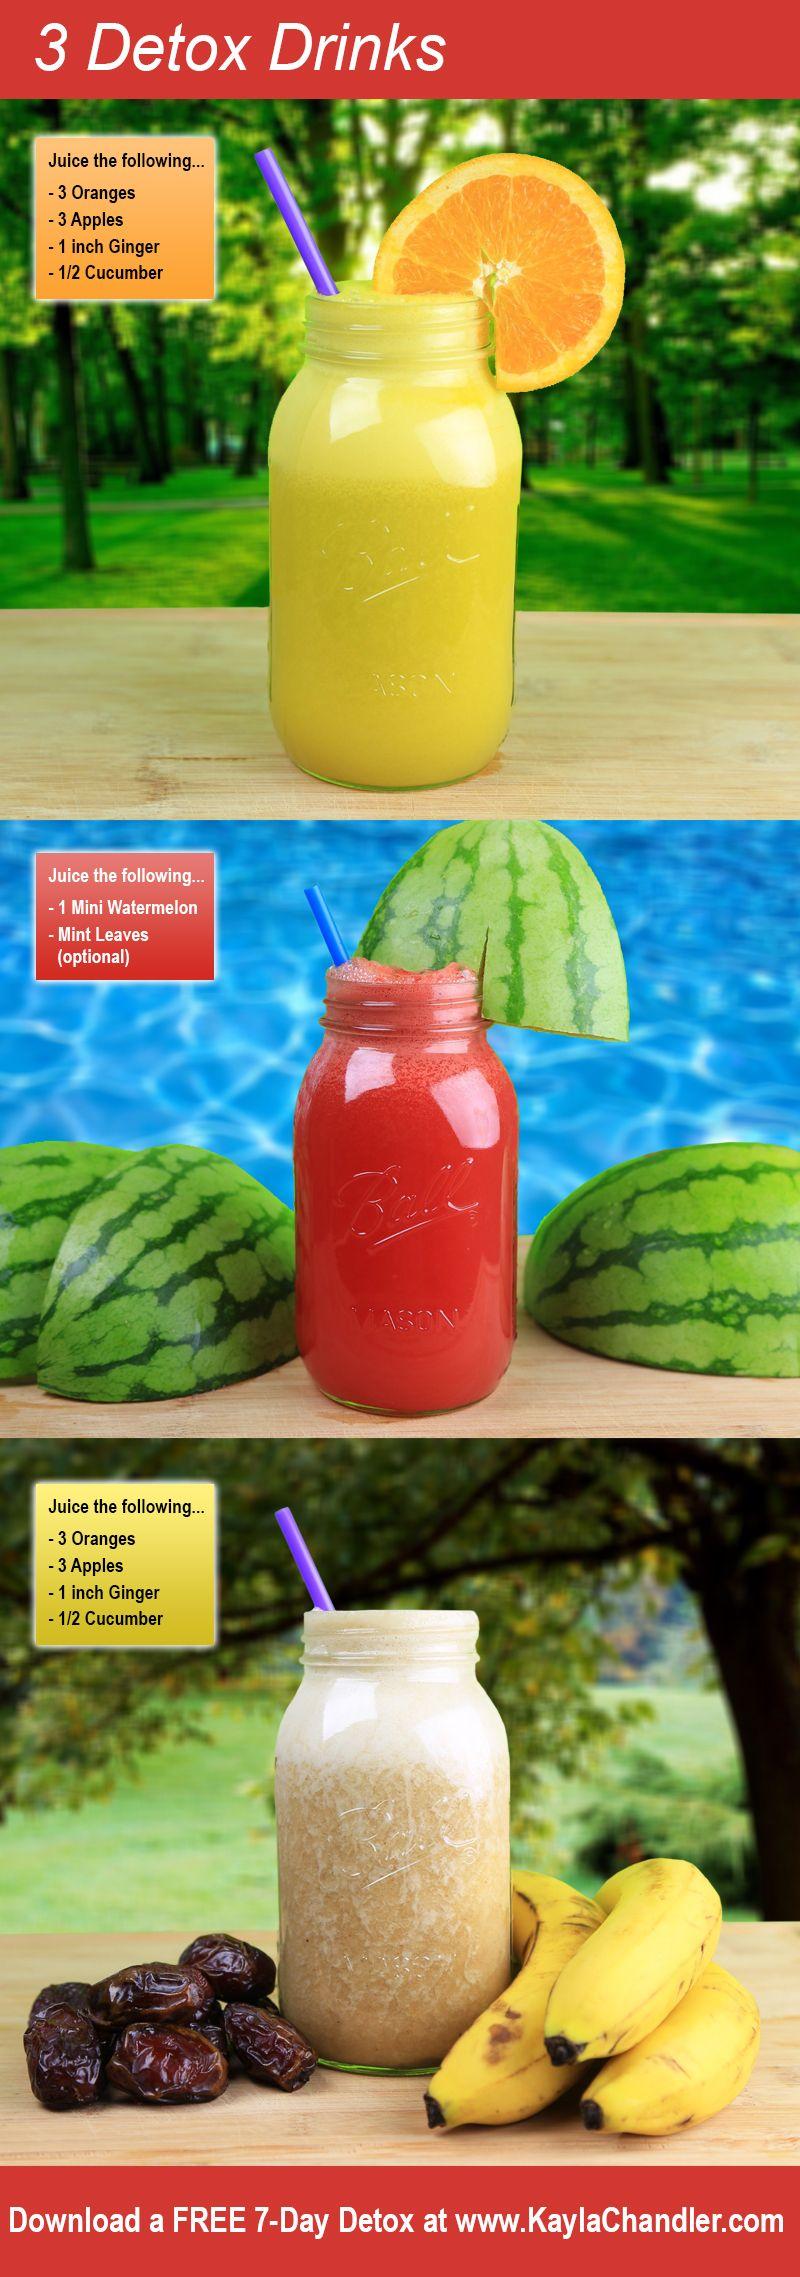 Lemon Ginger Tonic Water | Recipe | Smoothies | Detox diet drinks, Detox drinks, Detox juice cleanse